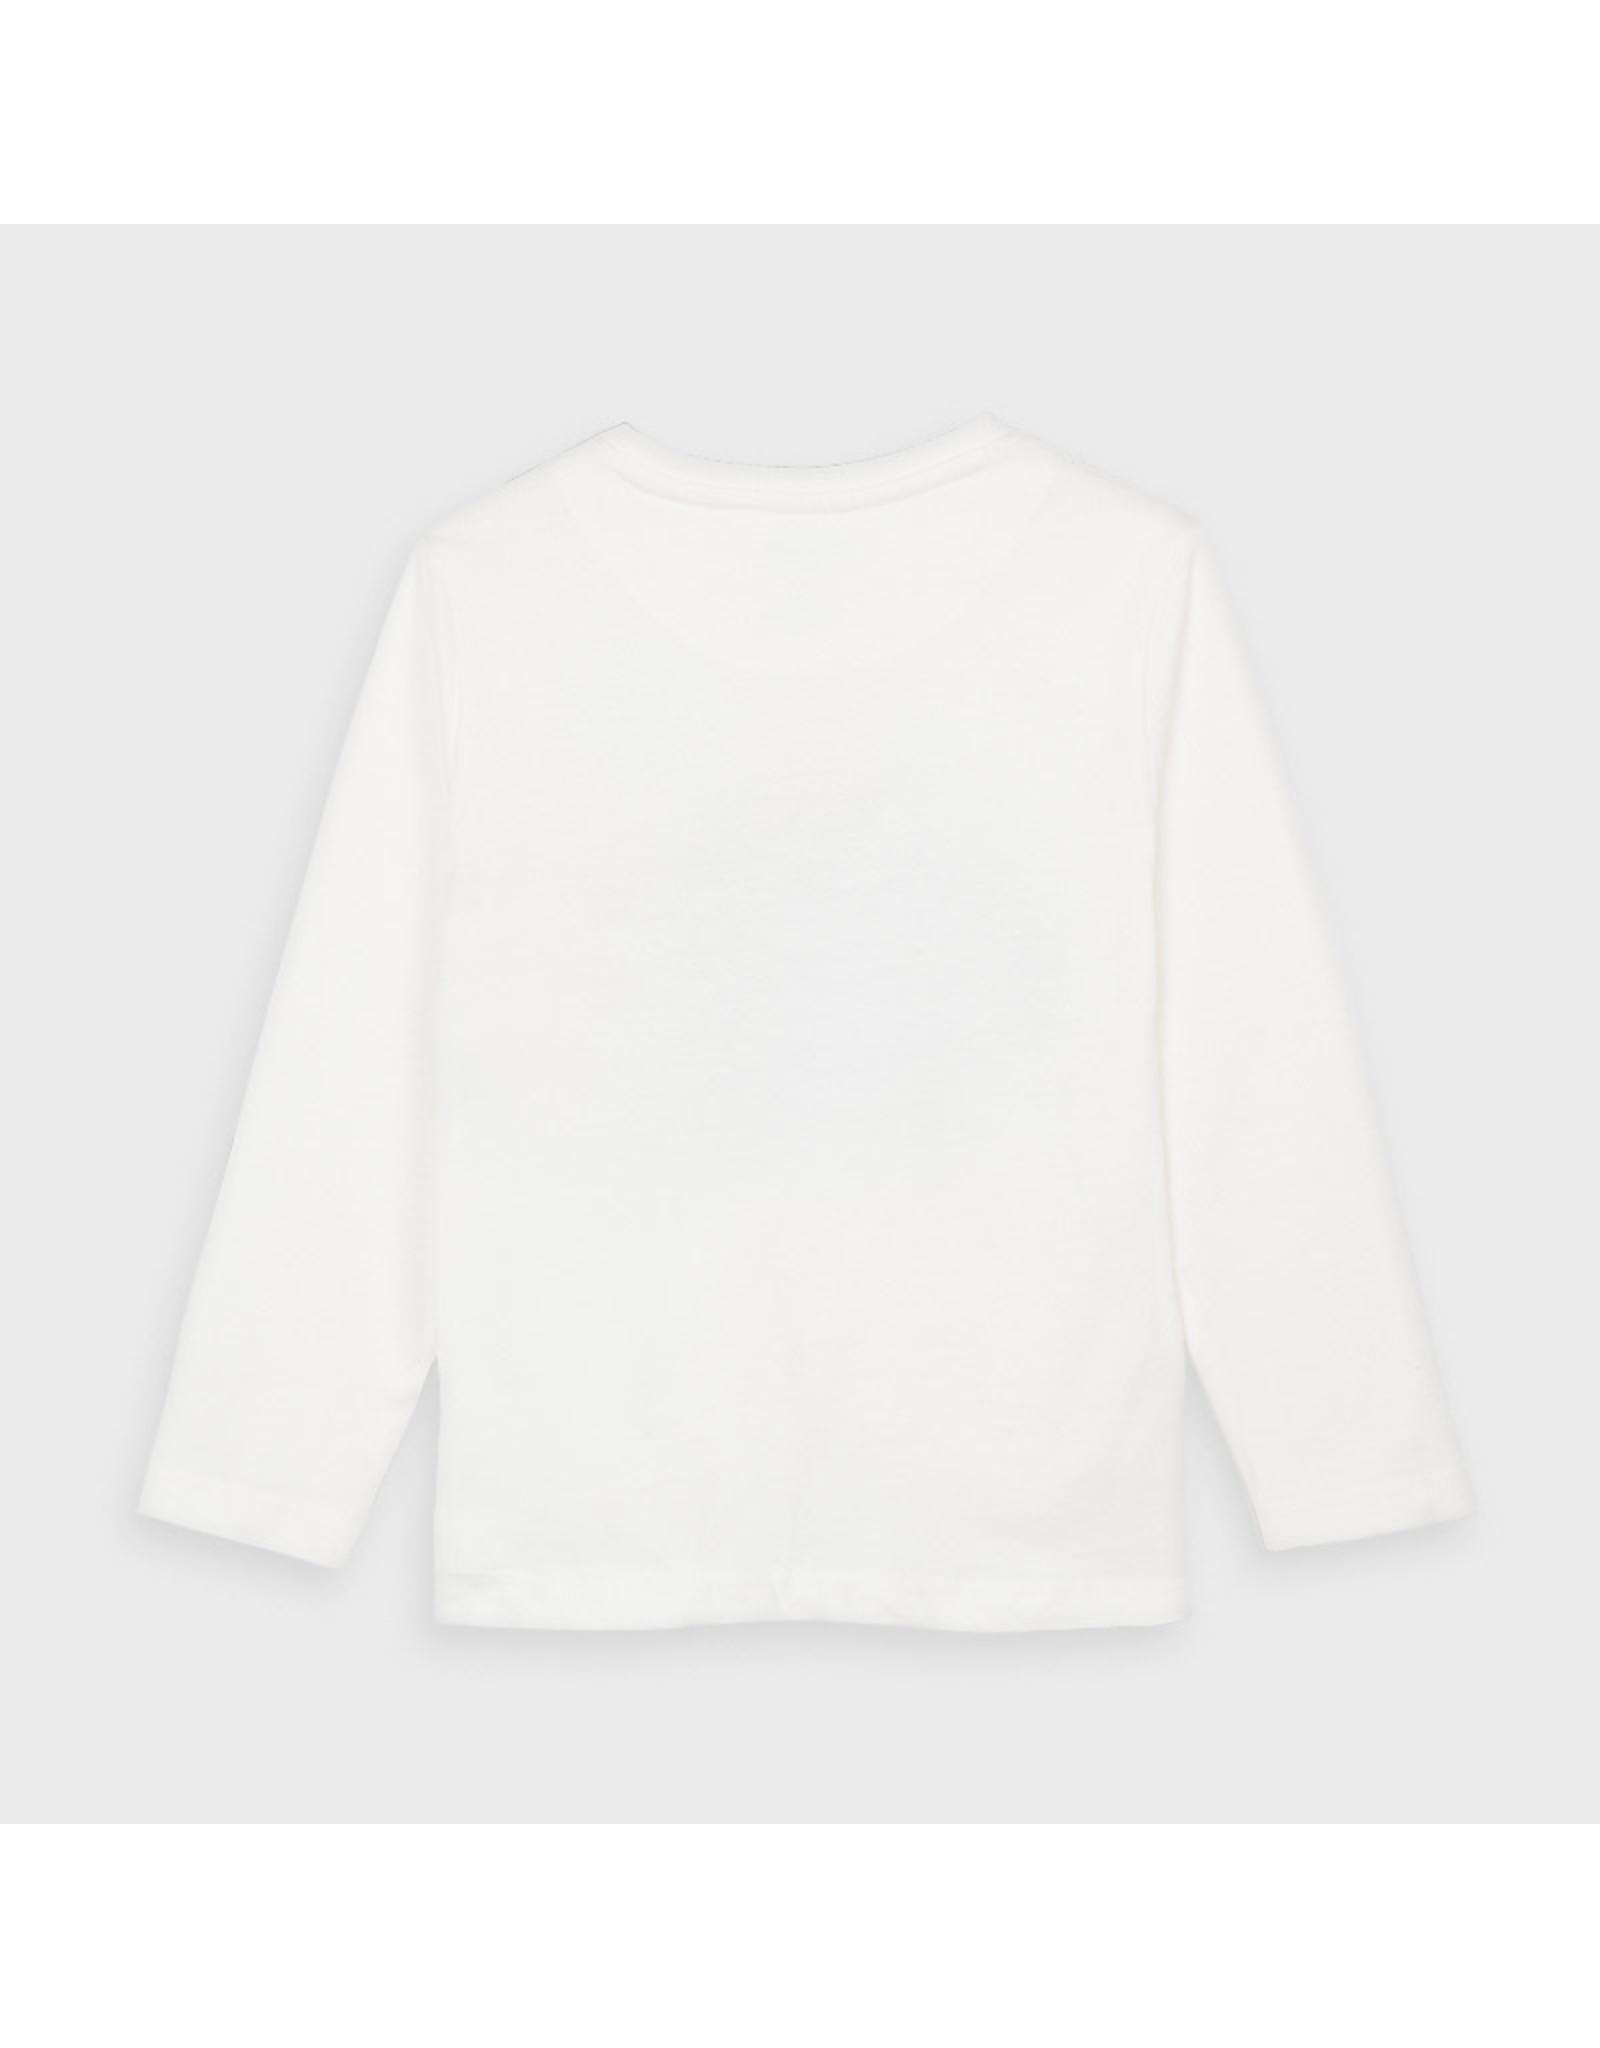 Mayoral L/s t-shirt Motor Cream